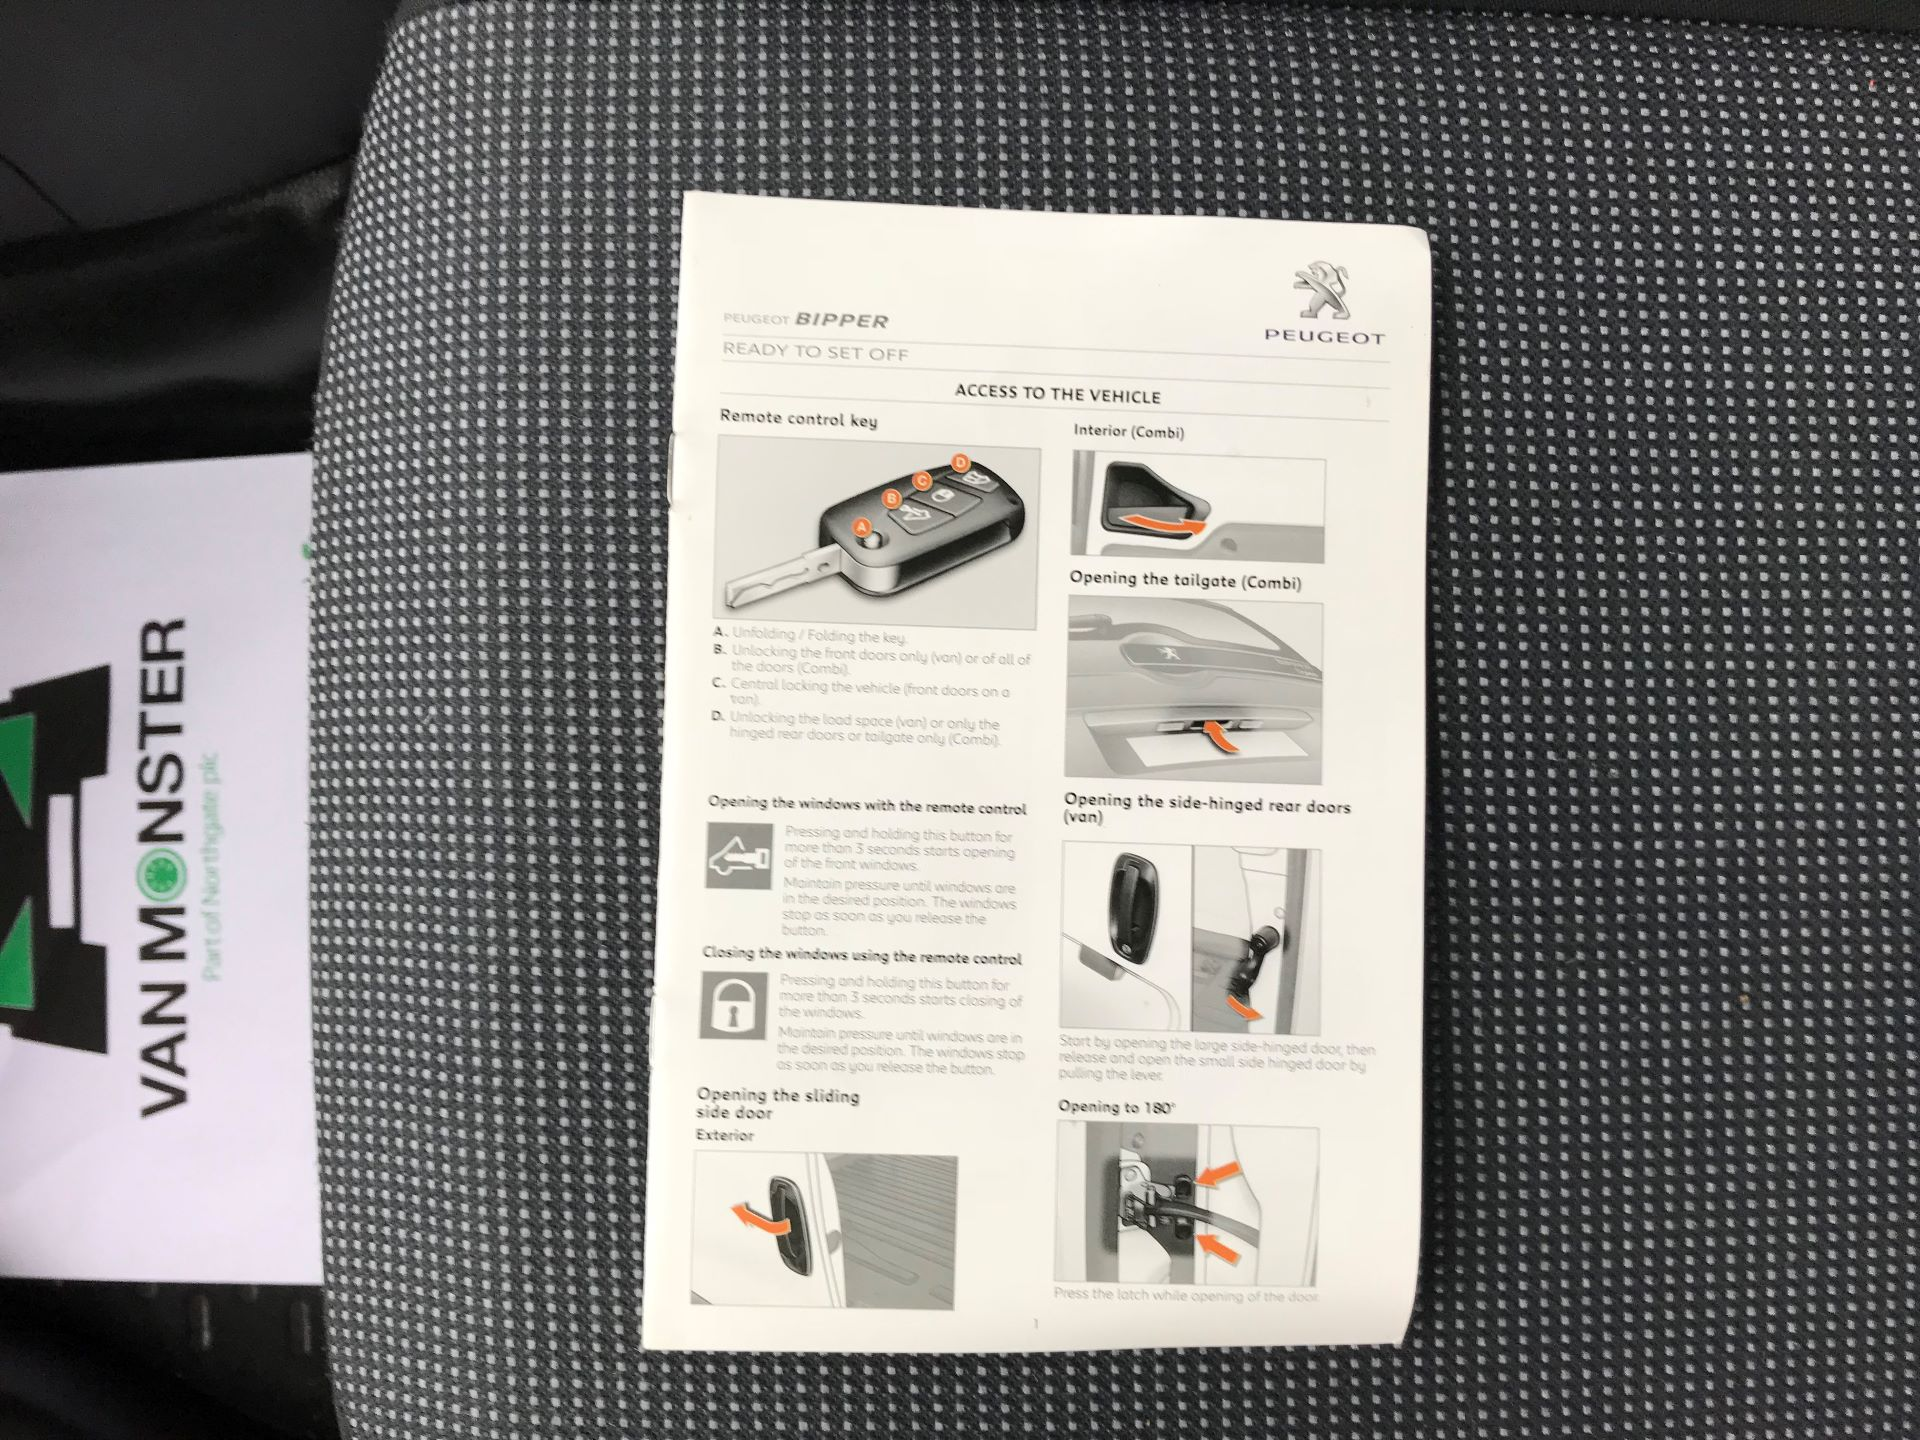 2016 Peugeot Bipper 1.3 HDI 75 S PLUS PACK NON S/S EURO 5 (NU16DLJ) Image 50